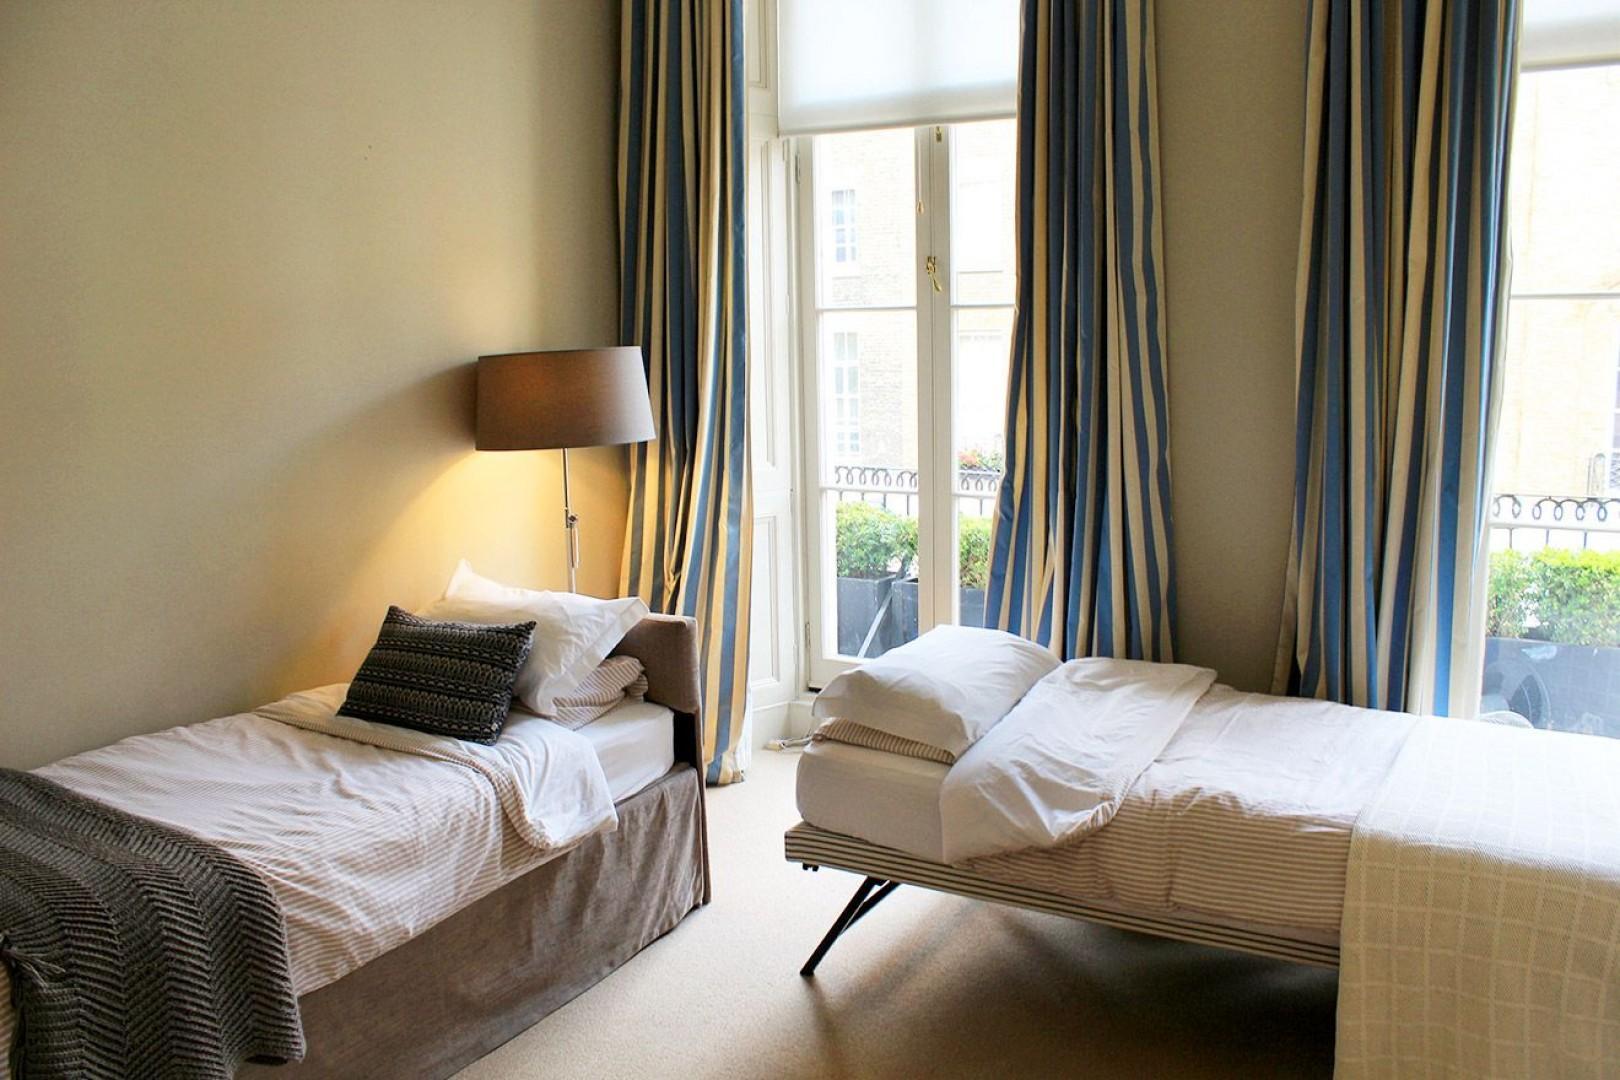 Bedroom 2 with two comfortable beds, desk and en suite bathroom